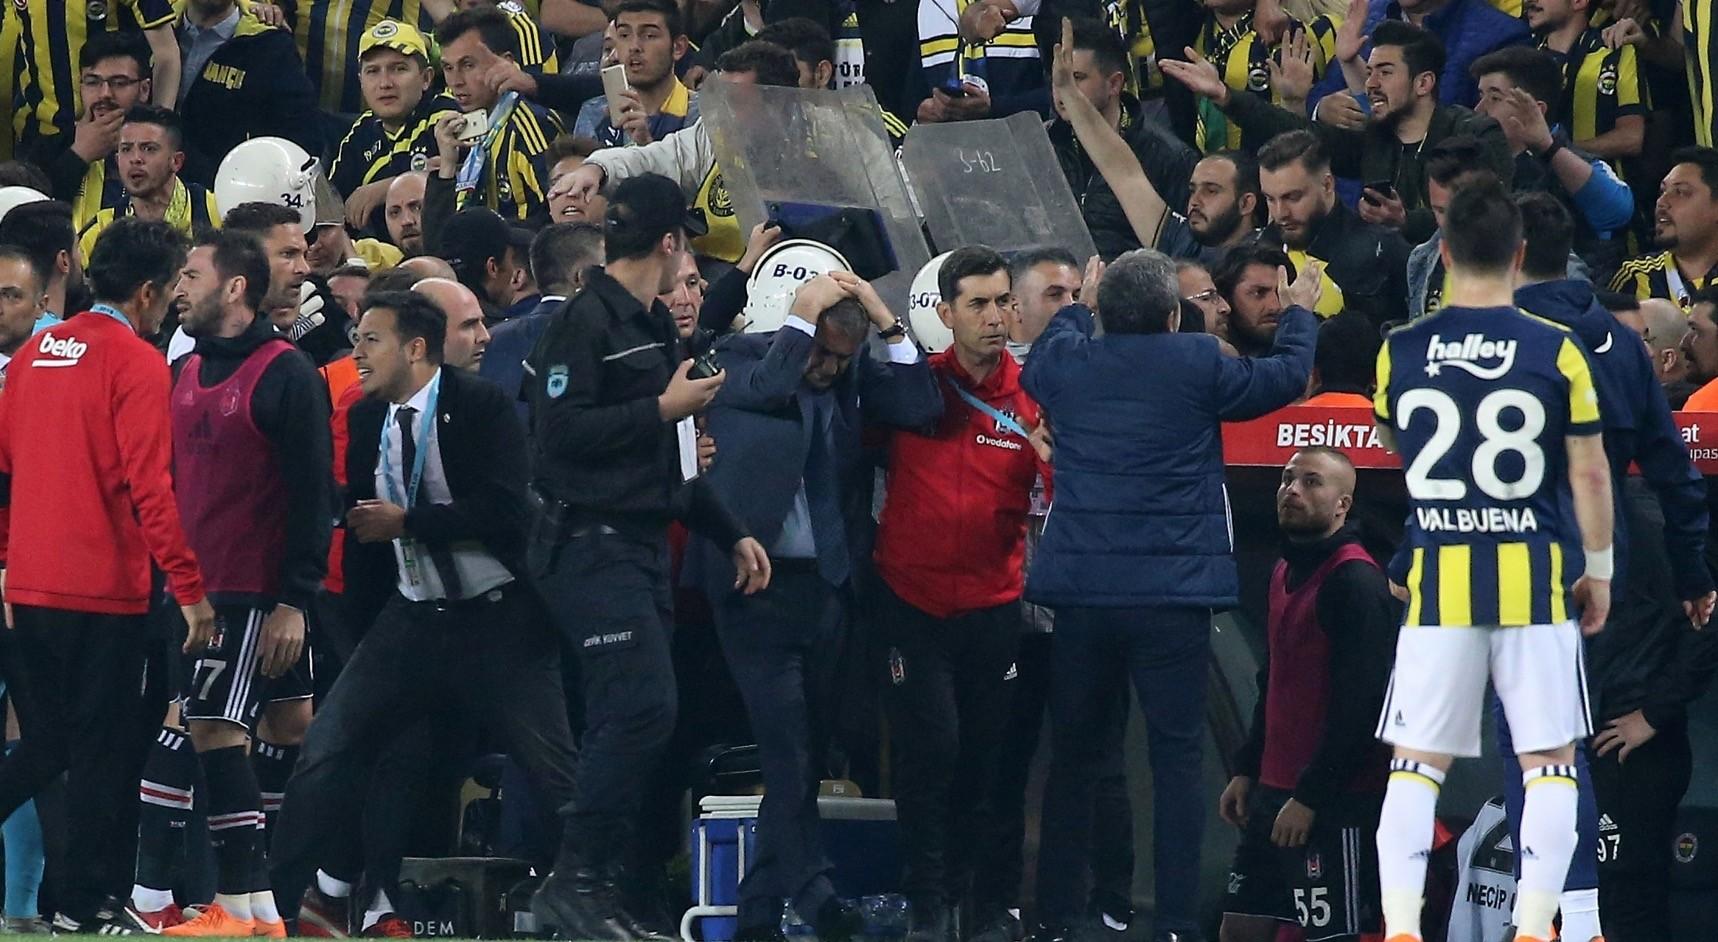 Besu0327iktasu0327 head coach Su0327enol Guu0308nesu0327 (C) holds his head after being hit by an object during the Ziraat Turkish Cup semi final second leg match between Fenerbahcu0327e and Besu0327iktasu0327 at Fenerbahcu0327e stadium in Istanbul.